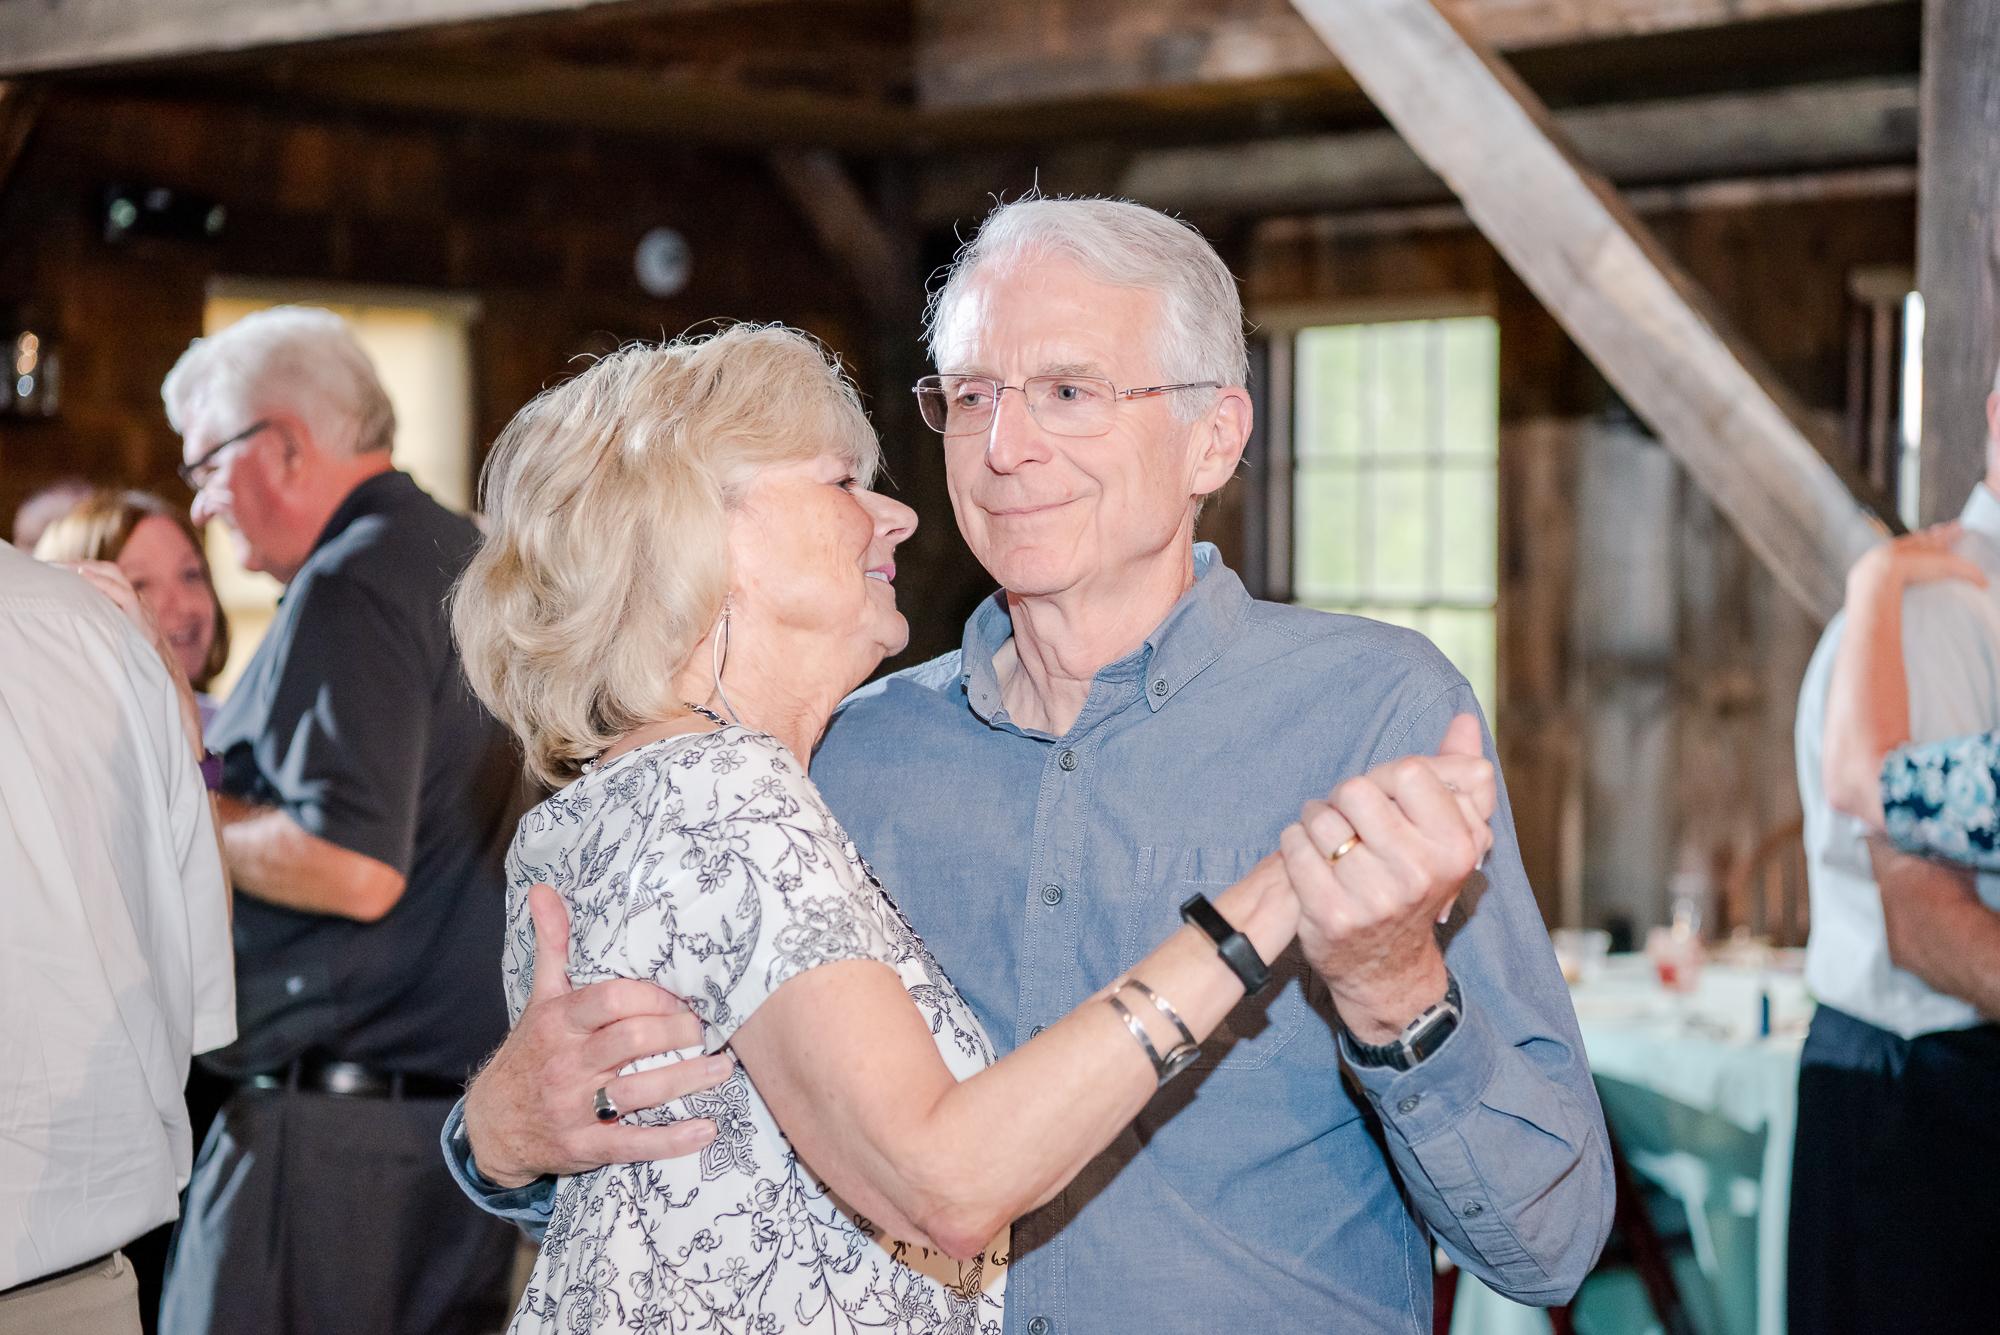 Maria+Adam_Summer Barn Wedding_The Barn at The North Star Preserve_Oberlin_Ohio-223.jpg